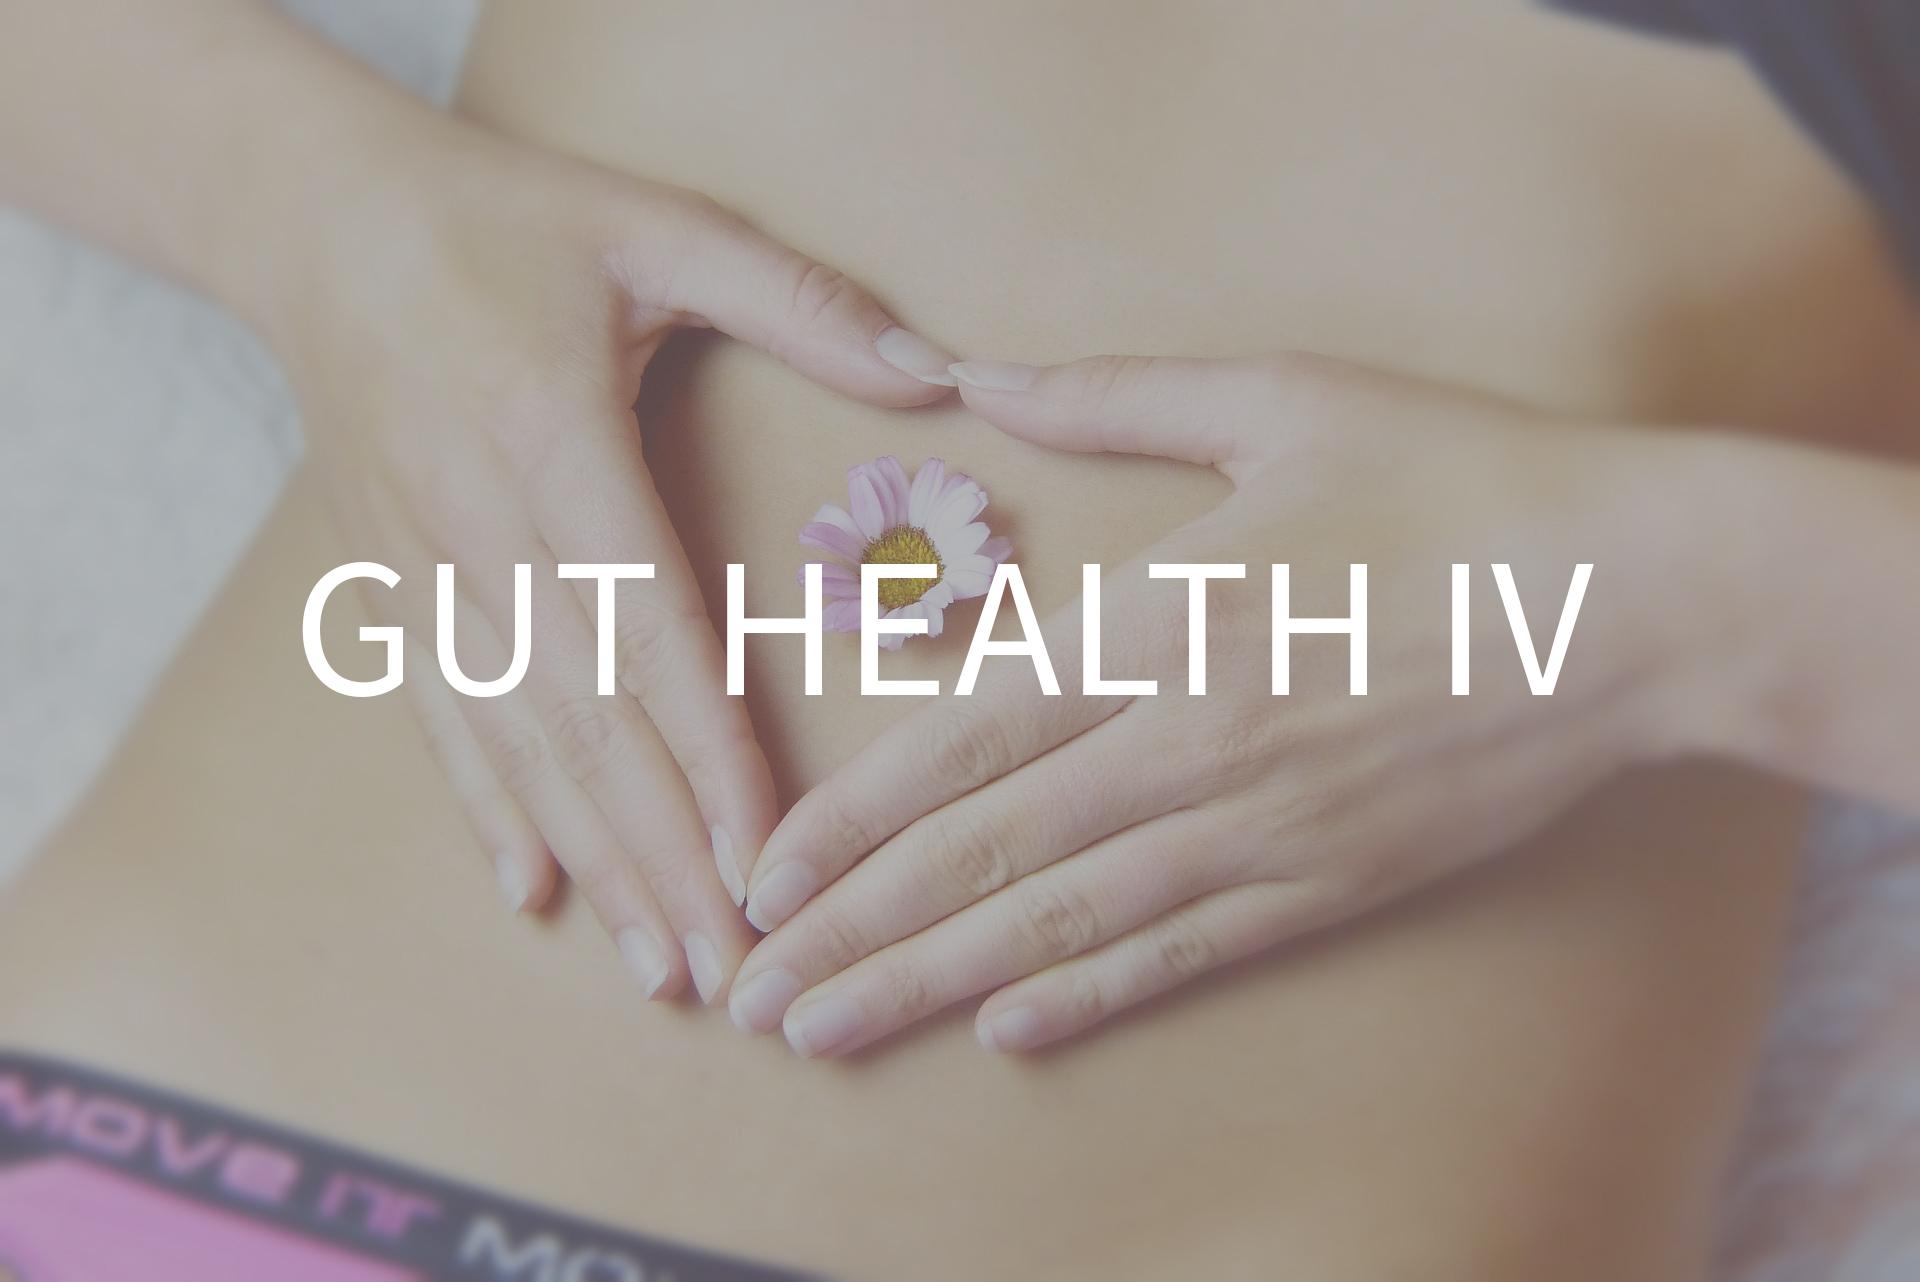 Emerald Gut Health IV